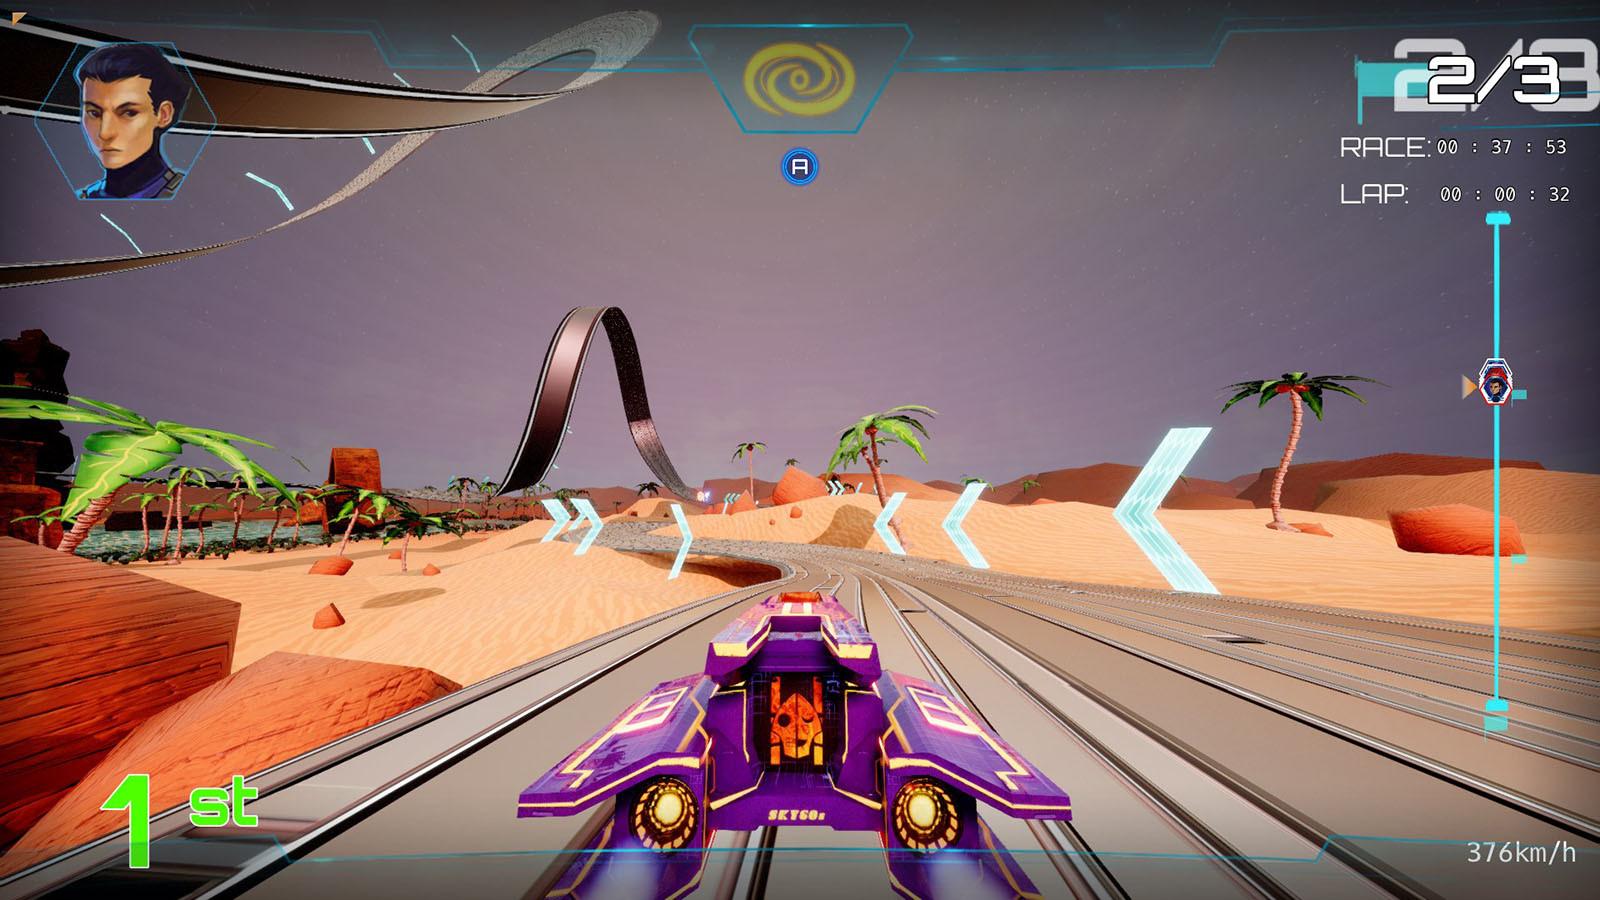 ScreenShot_GamePlay_FallenCity_169_02.jpg